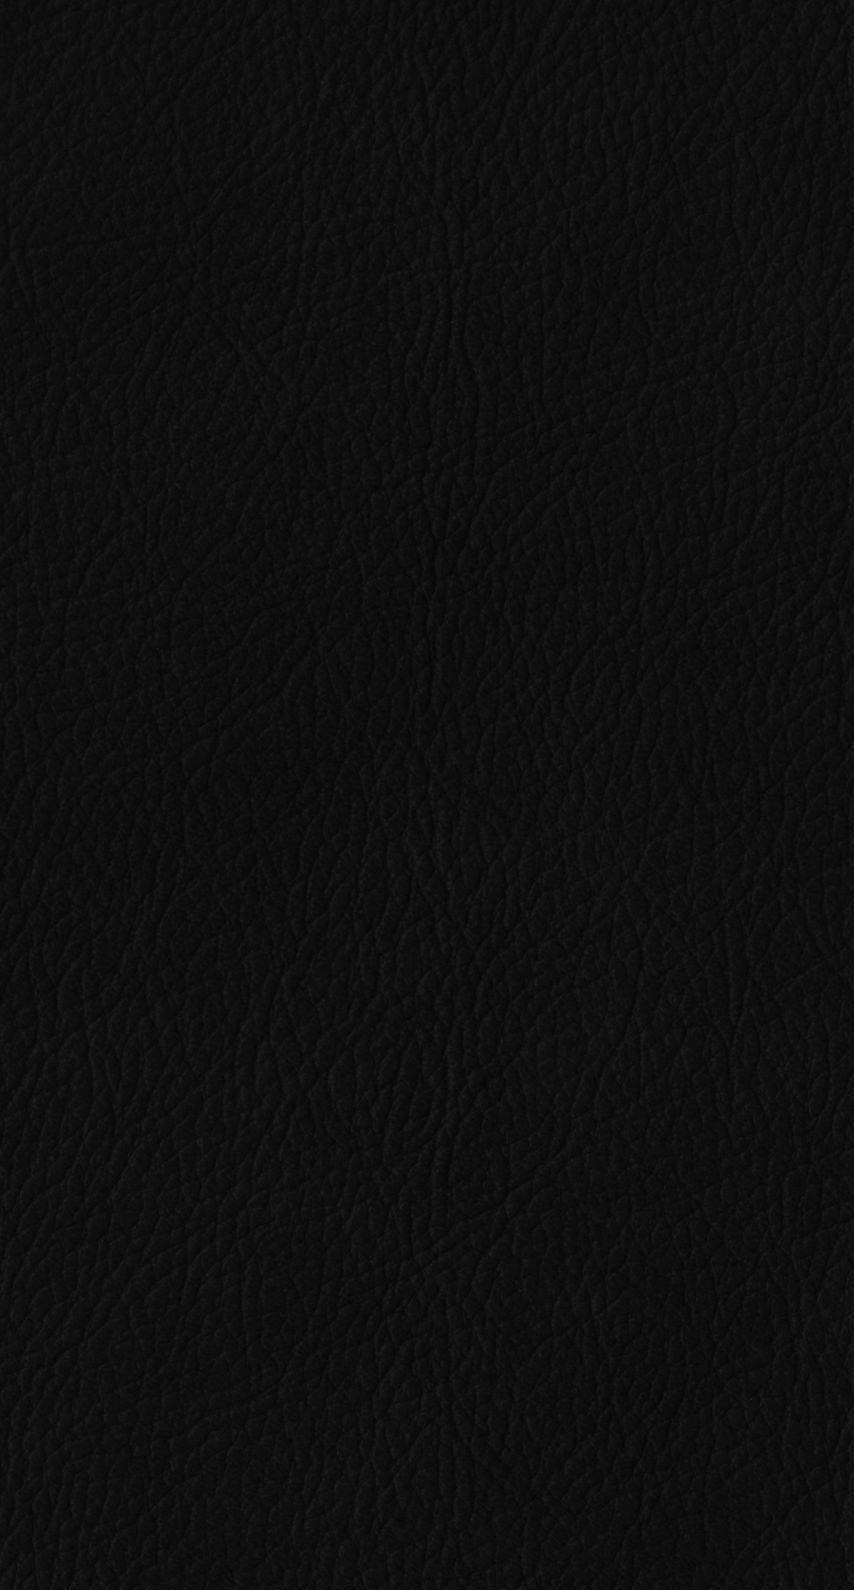 As Black Screen iPhone Wallpapers on WallpaperDog